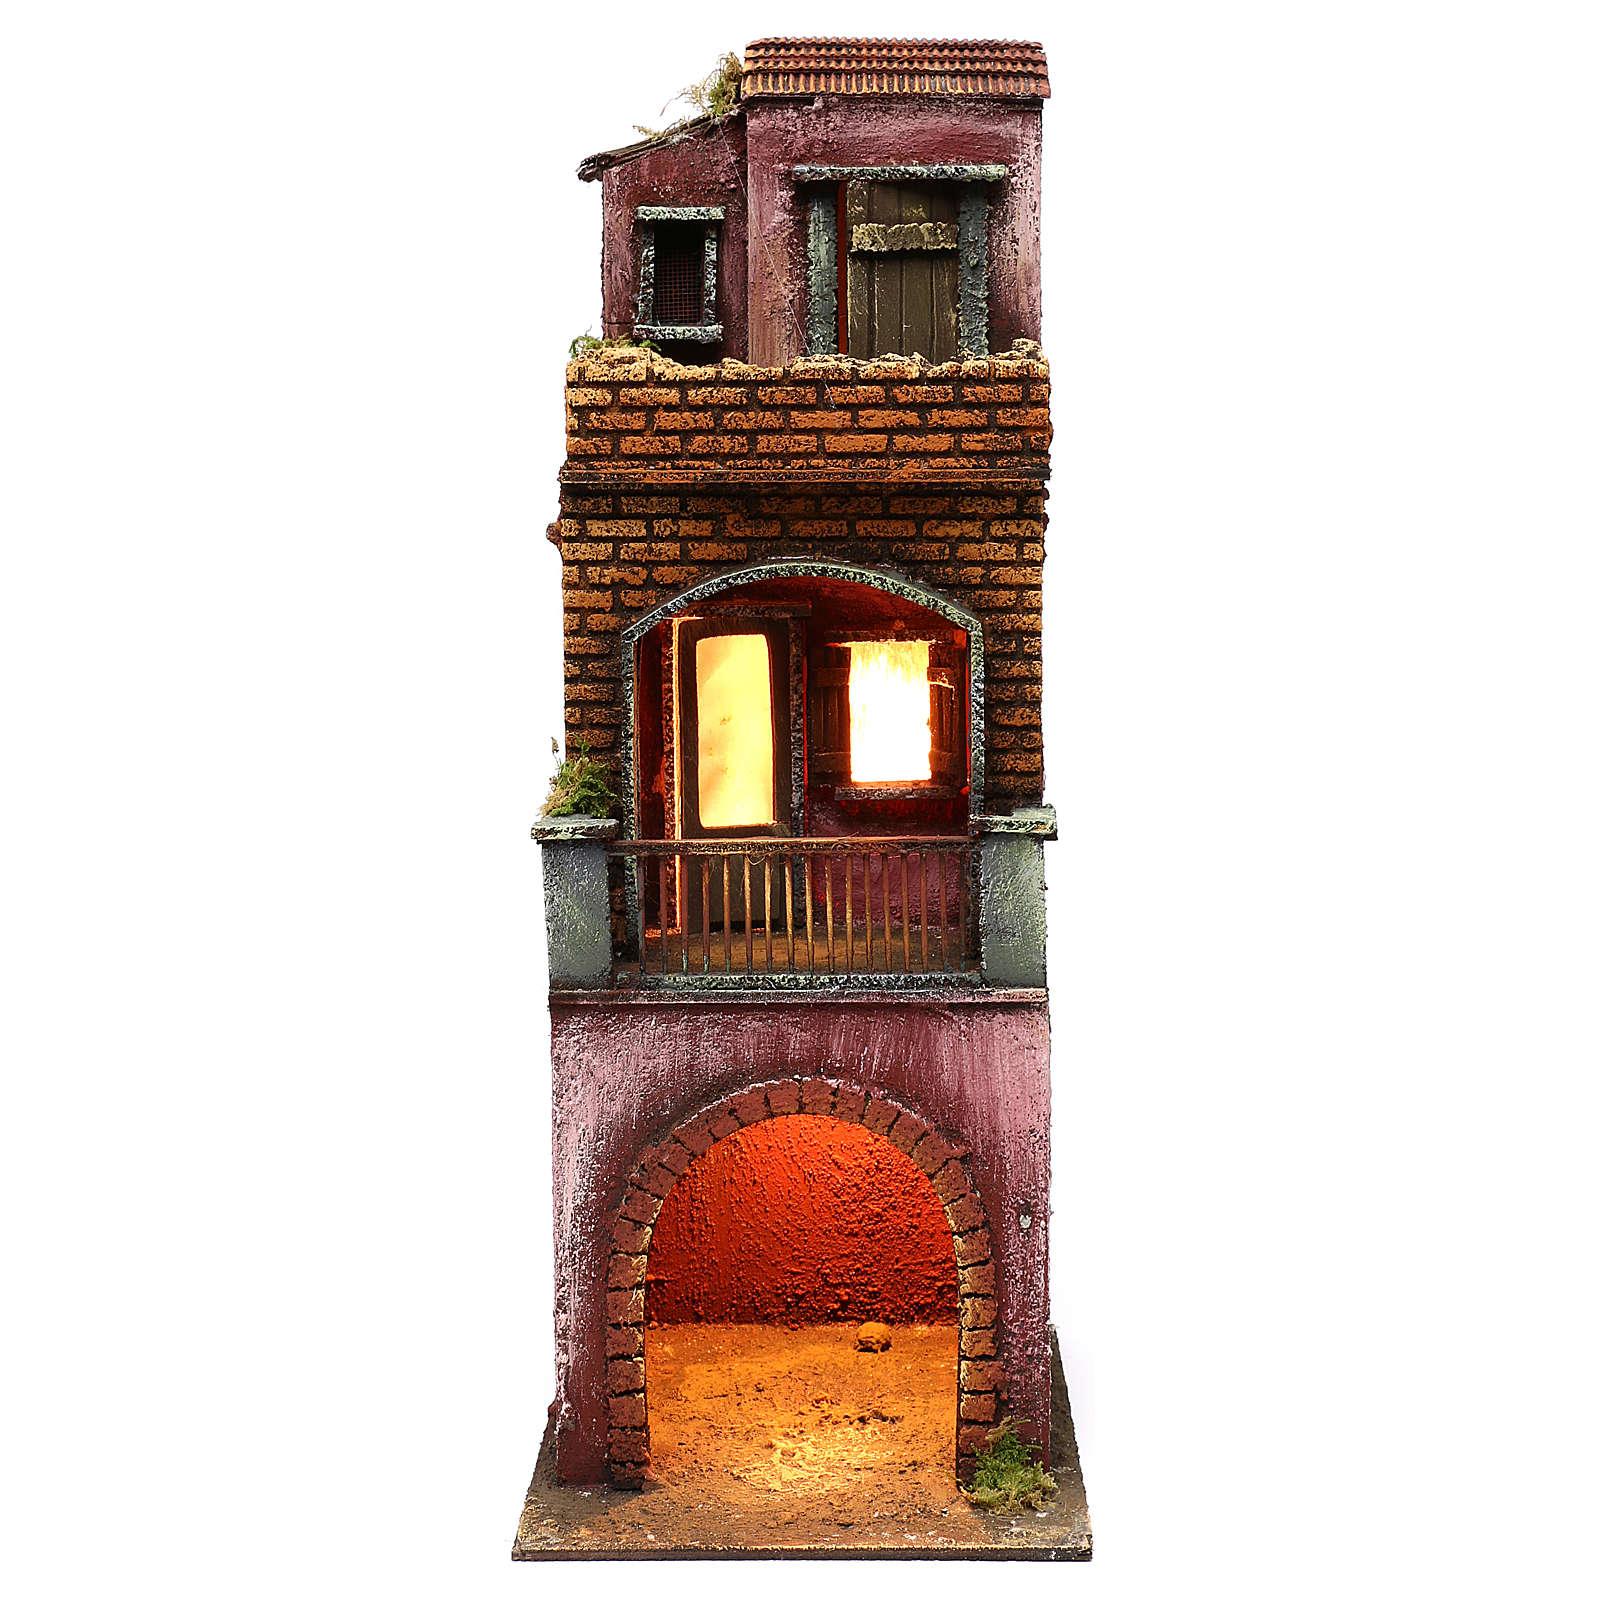 Bloque de viviendas tres pisos belén napolitano 45x20x20 4